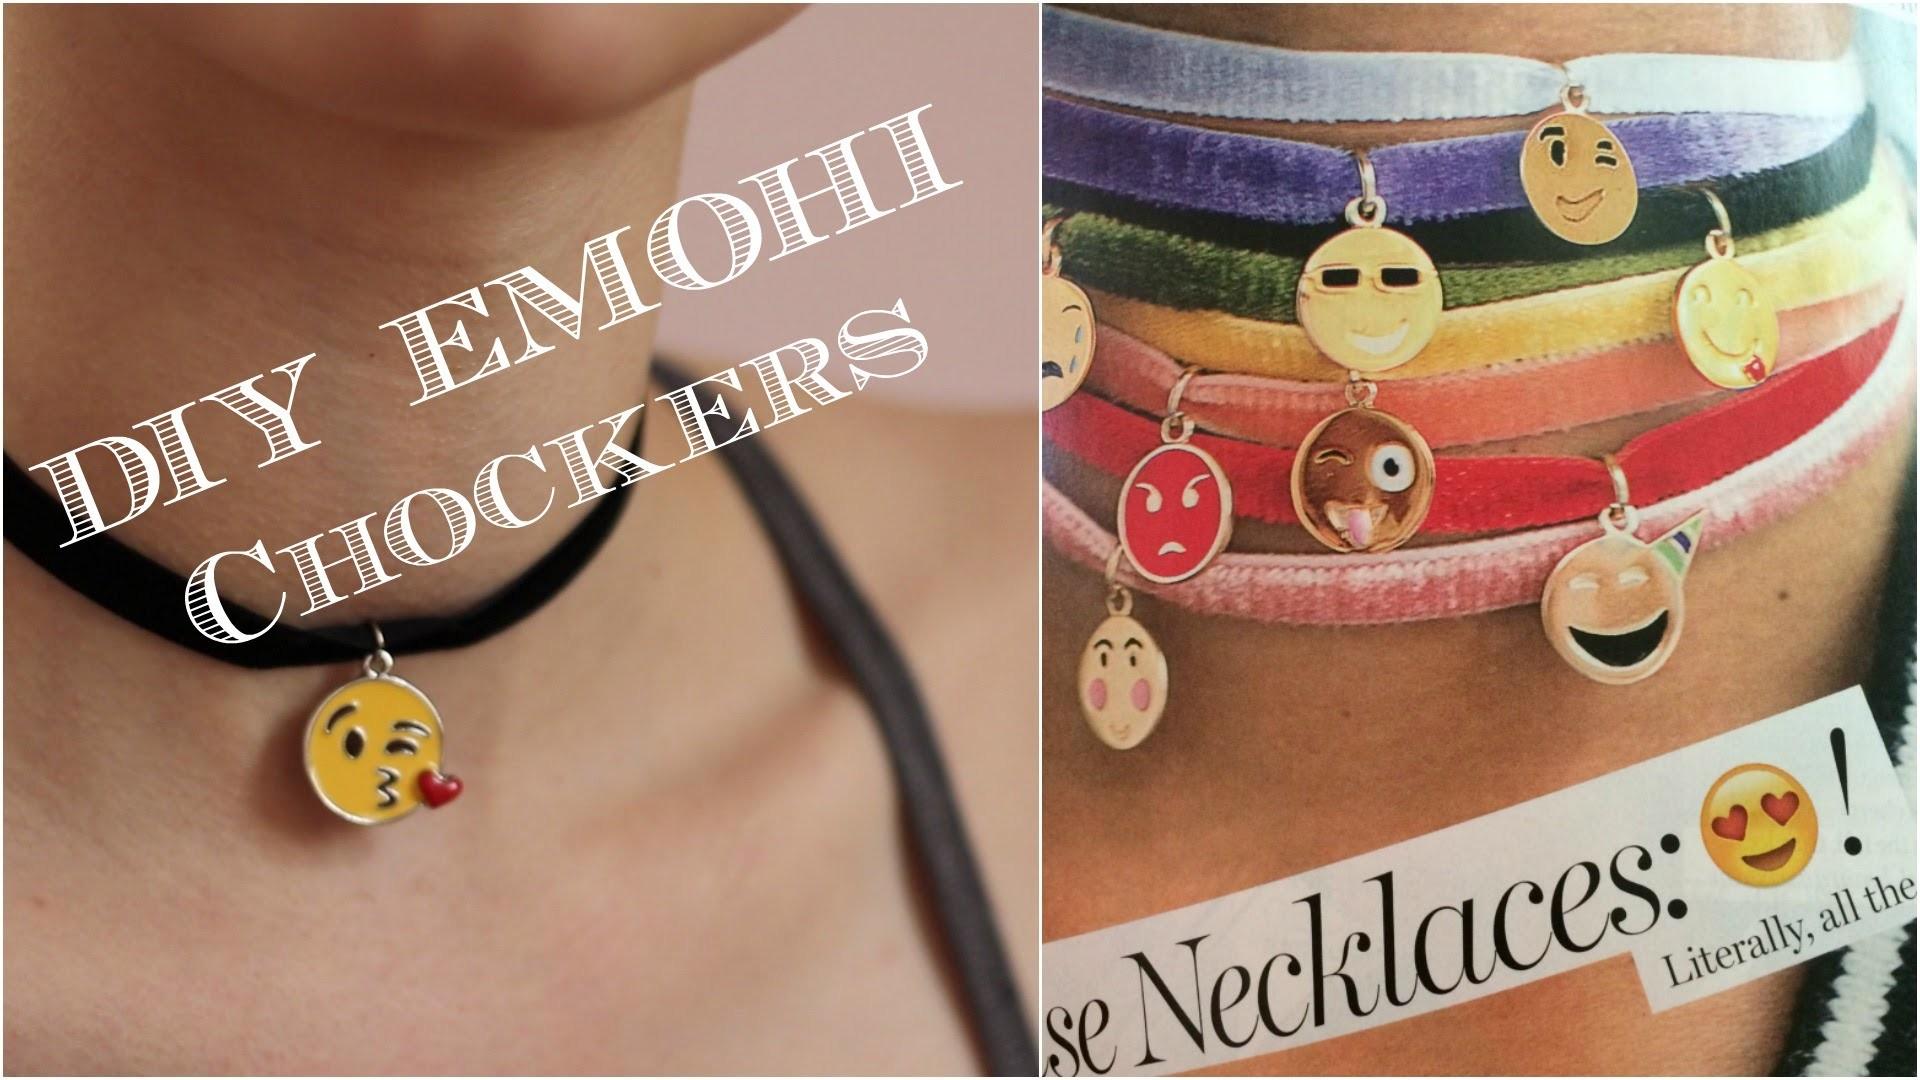 DIY Chocker - How to Make an Emoji Choker - Necklace Tutorial